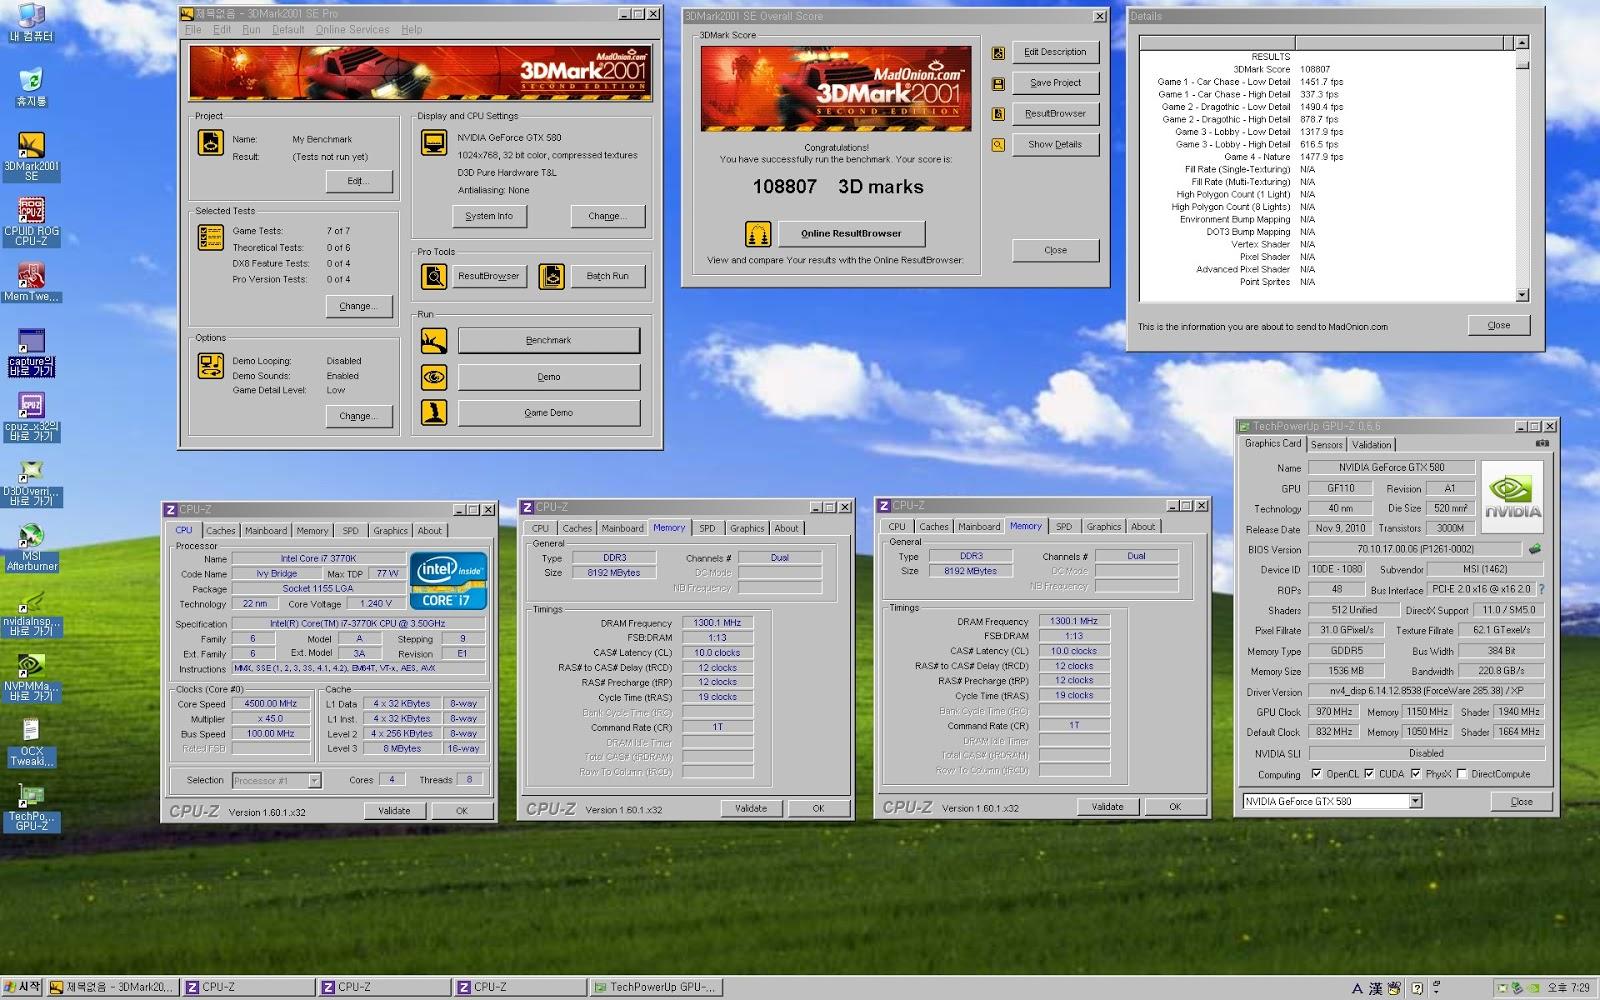 ASUS+Z77+MG5+3DMark01+result.jpg